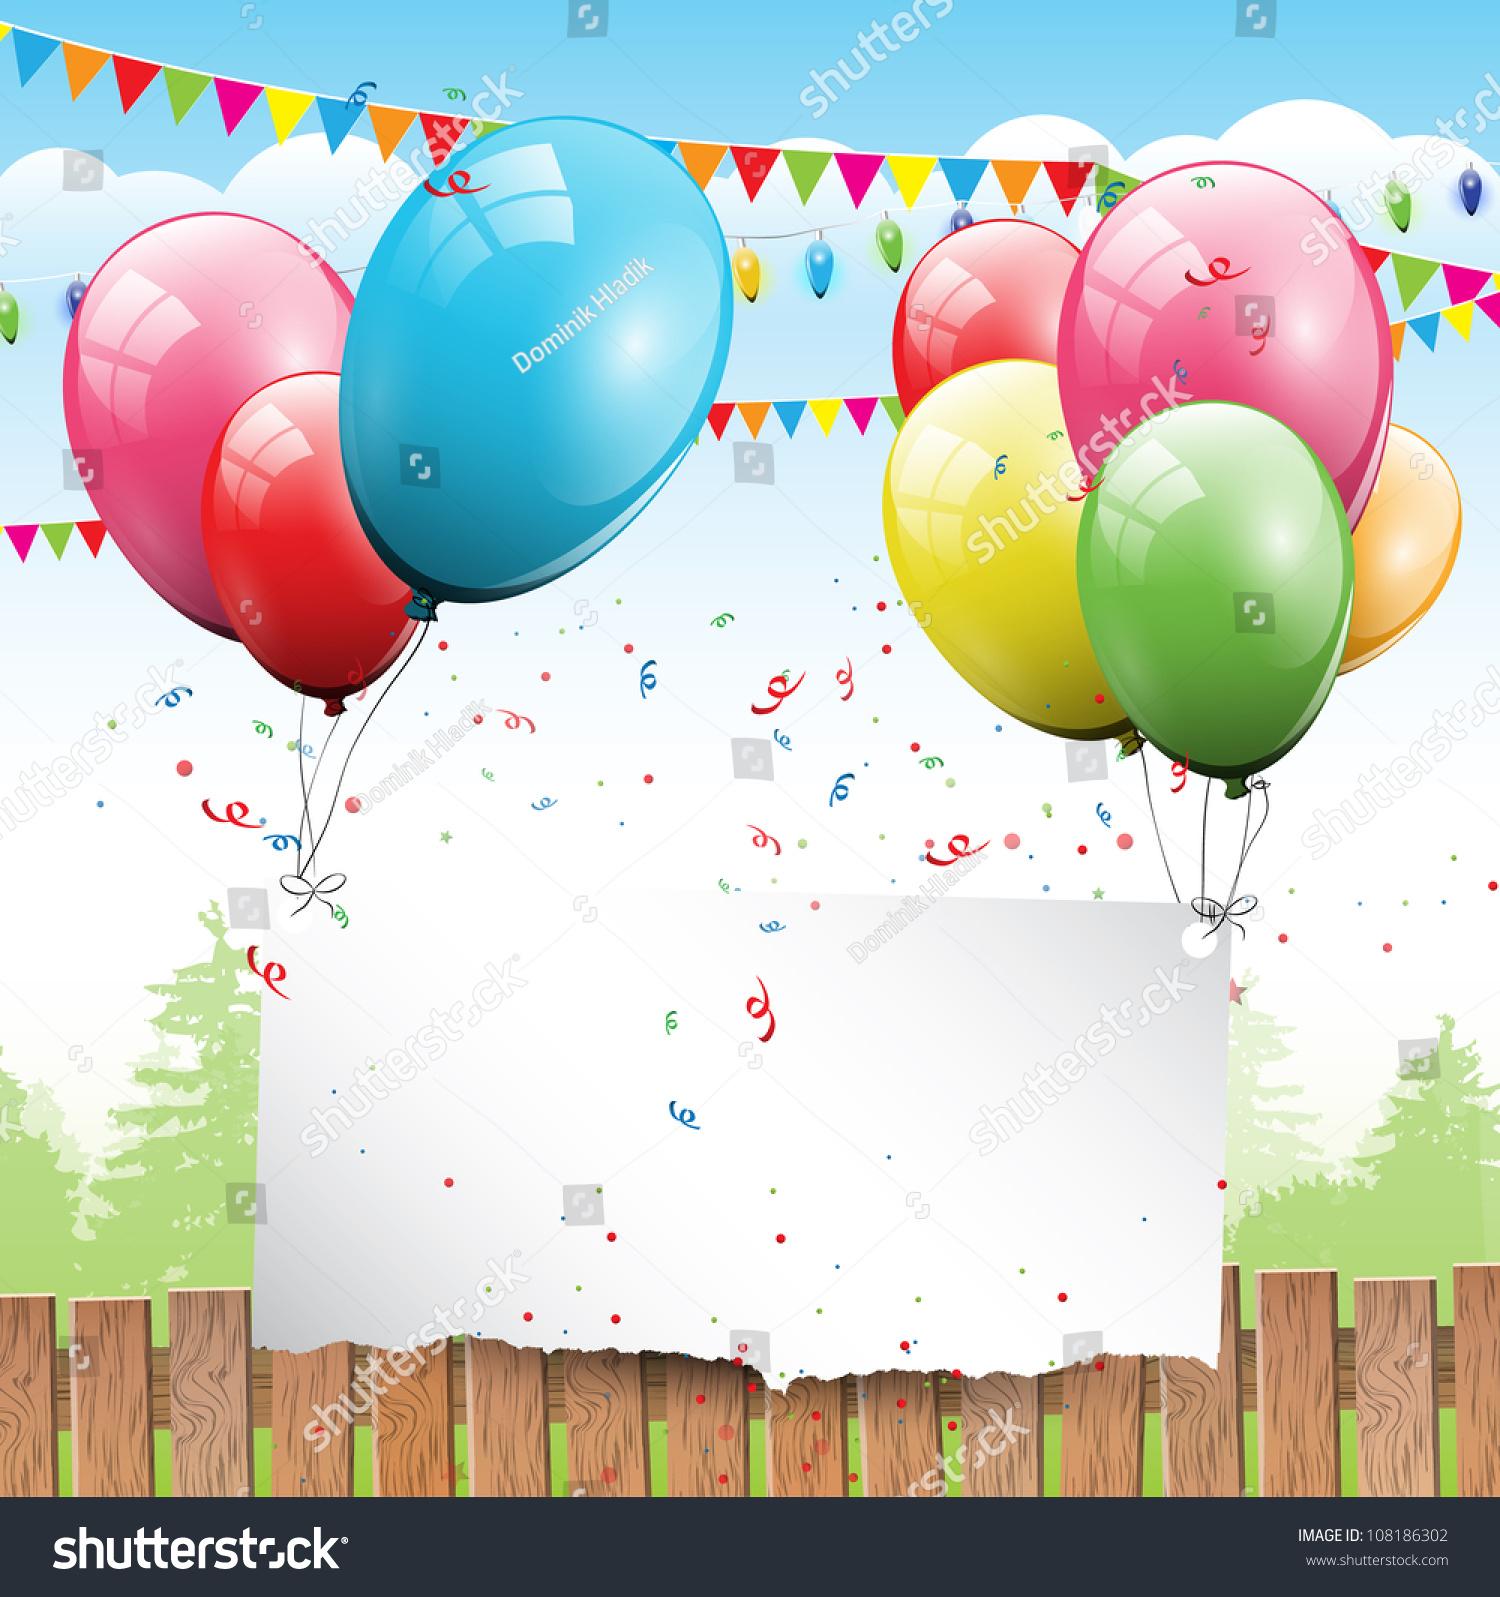 Adult birthday graphic myspace